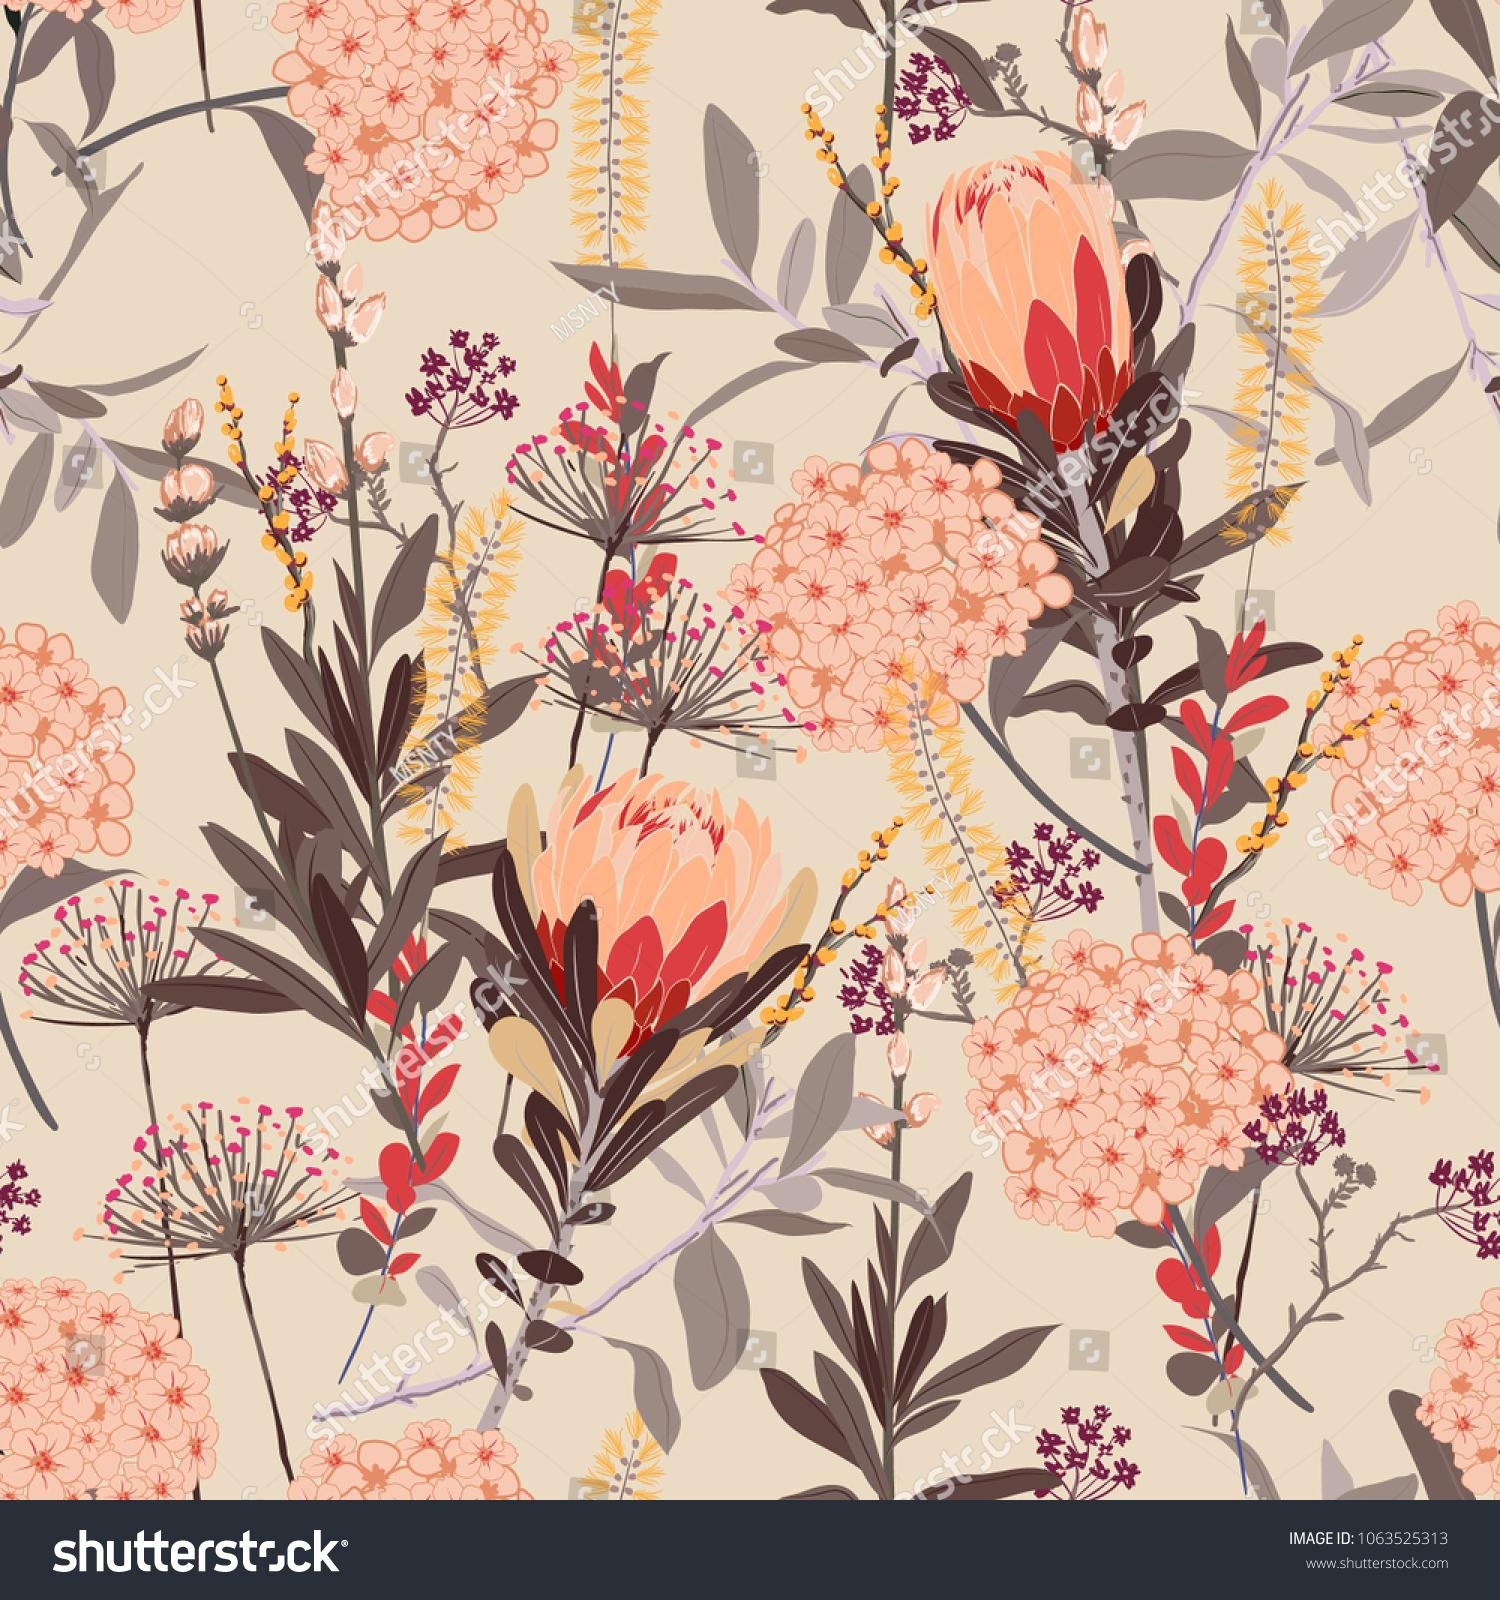 Vintage Floral Pattern Many Kind Flowers Royalty Free Stock Image